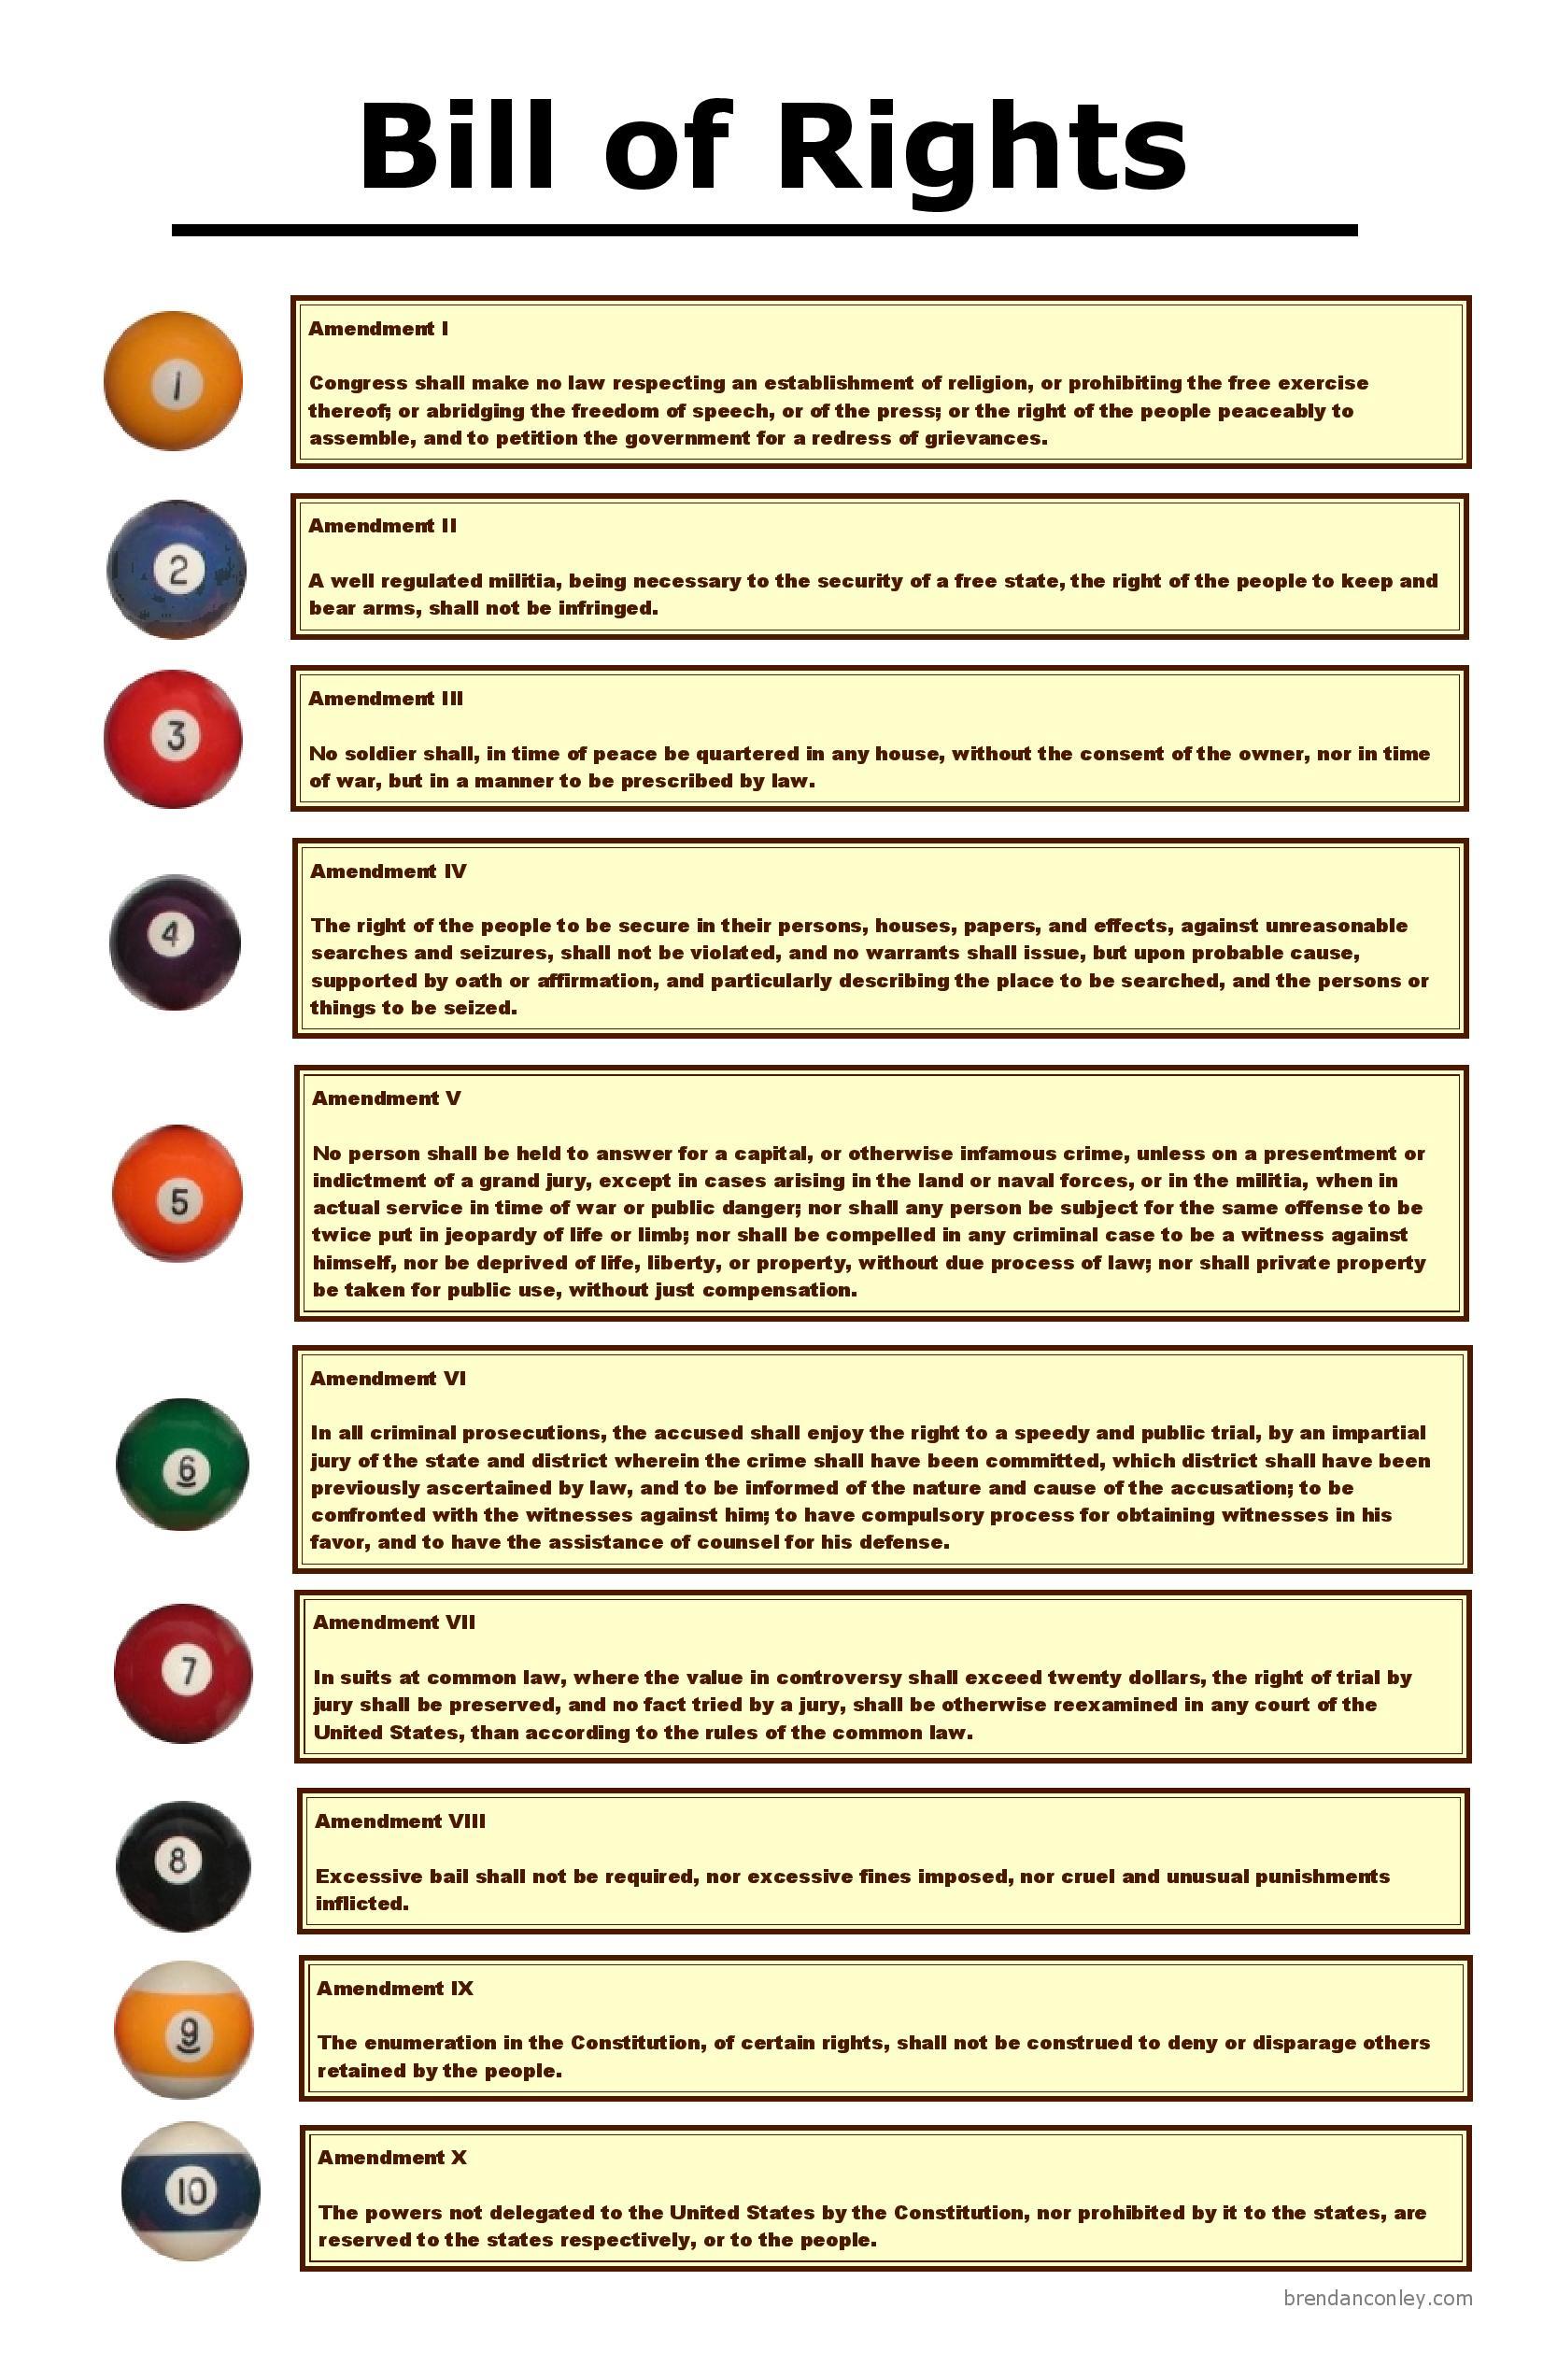 Bill Of Rights And Reconstruction Amendments